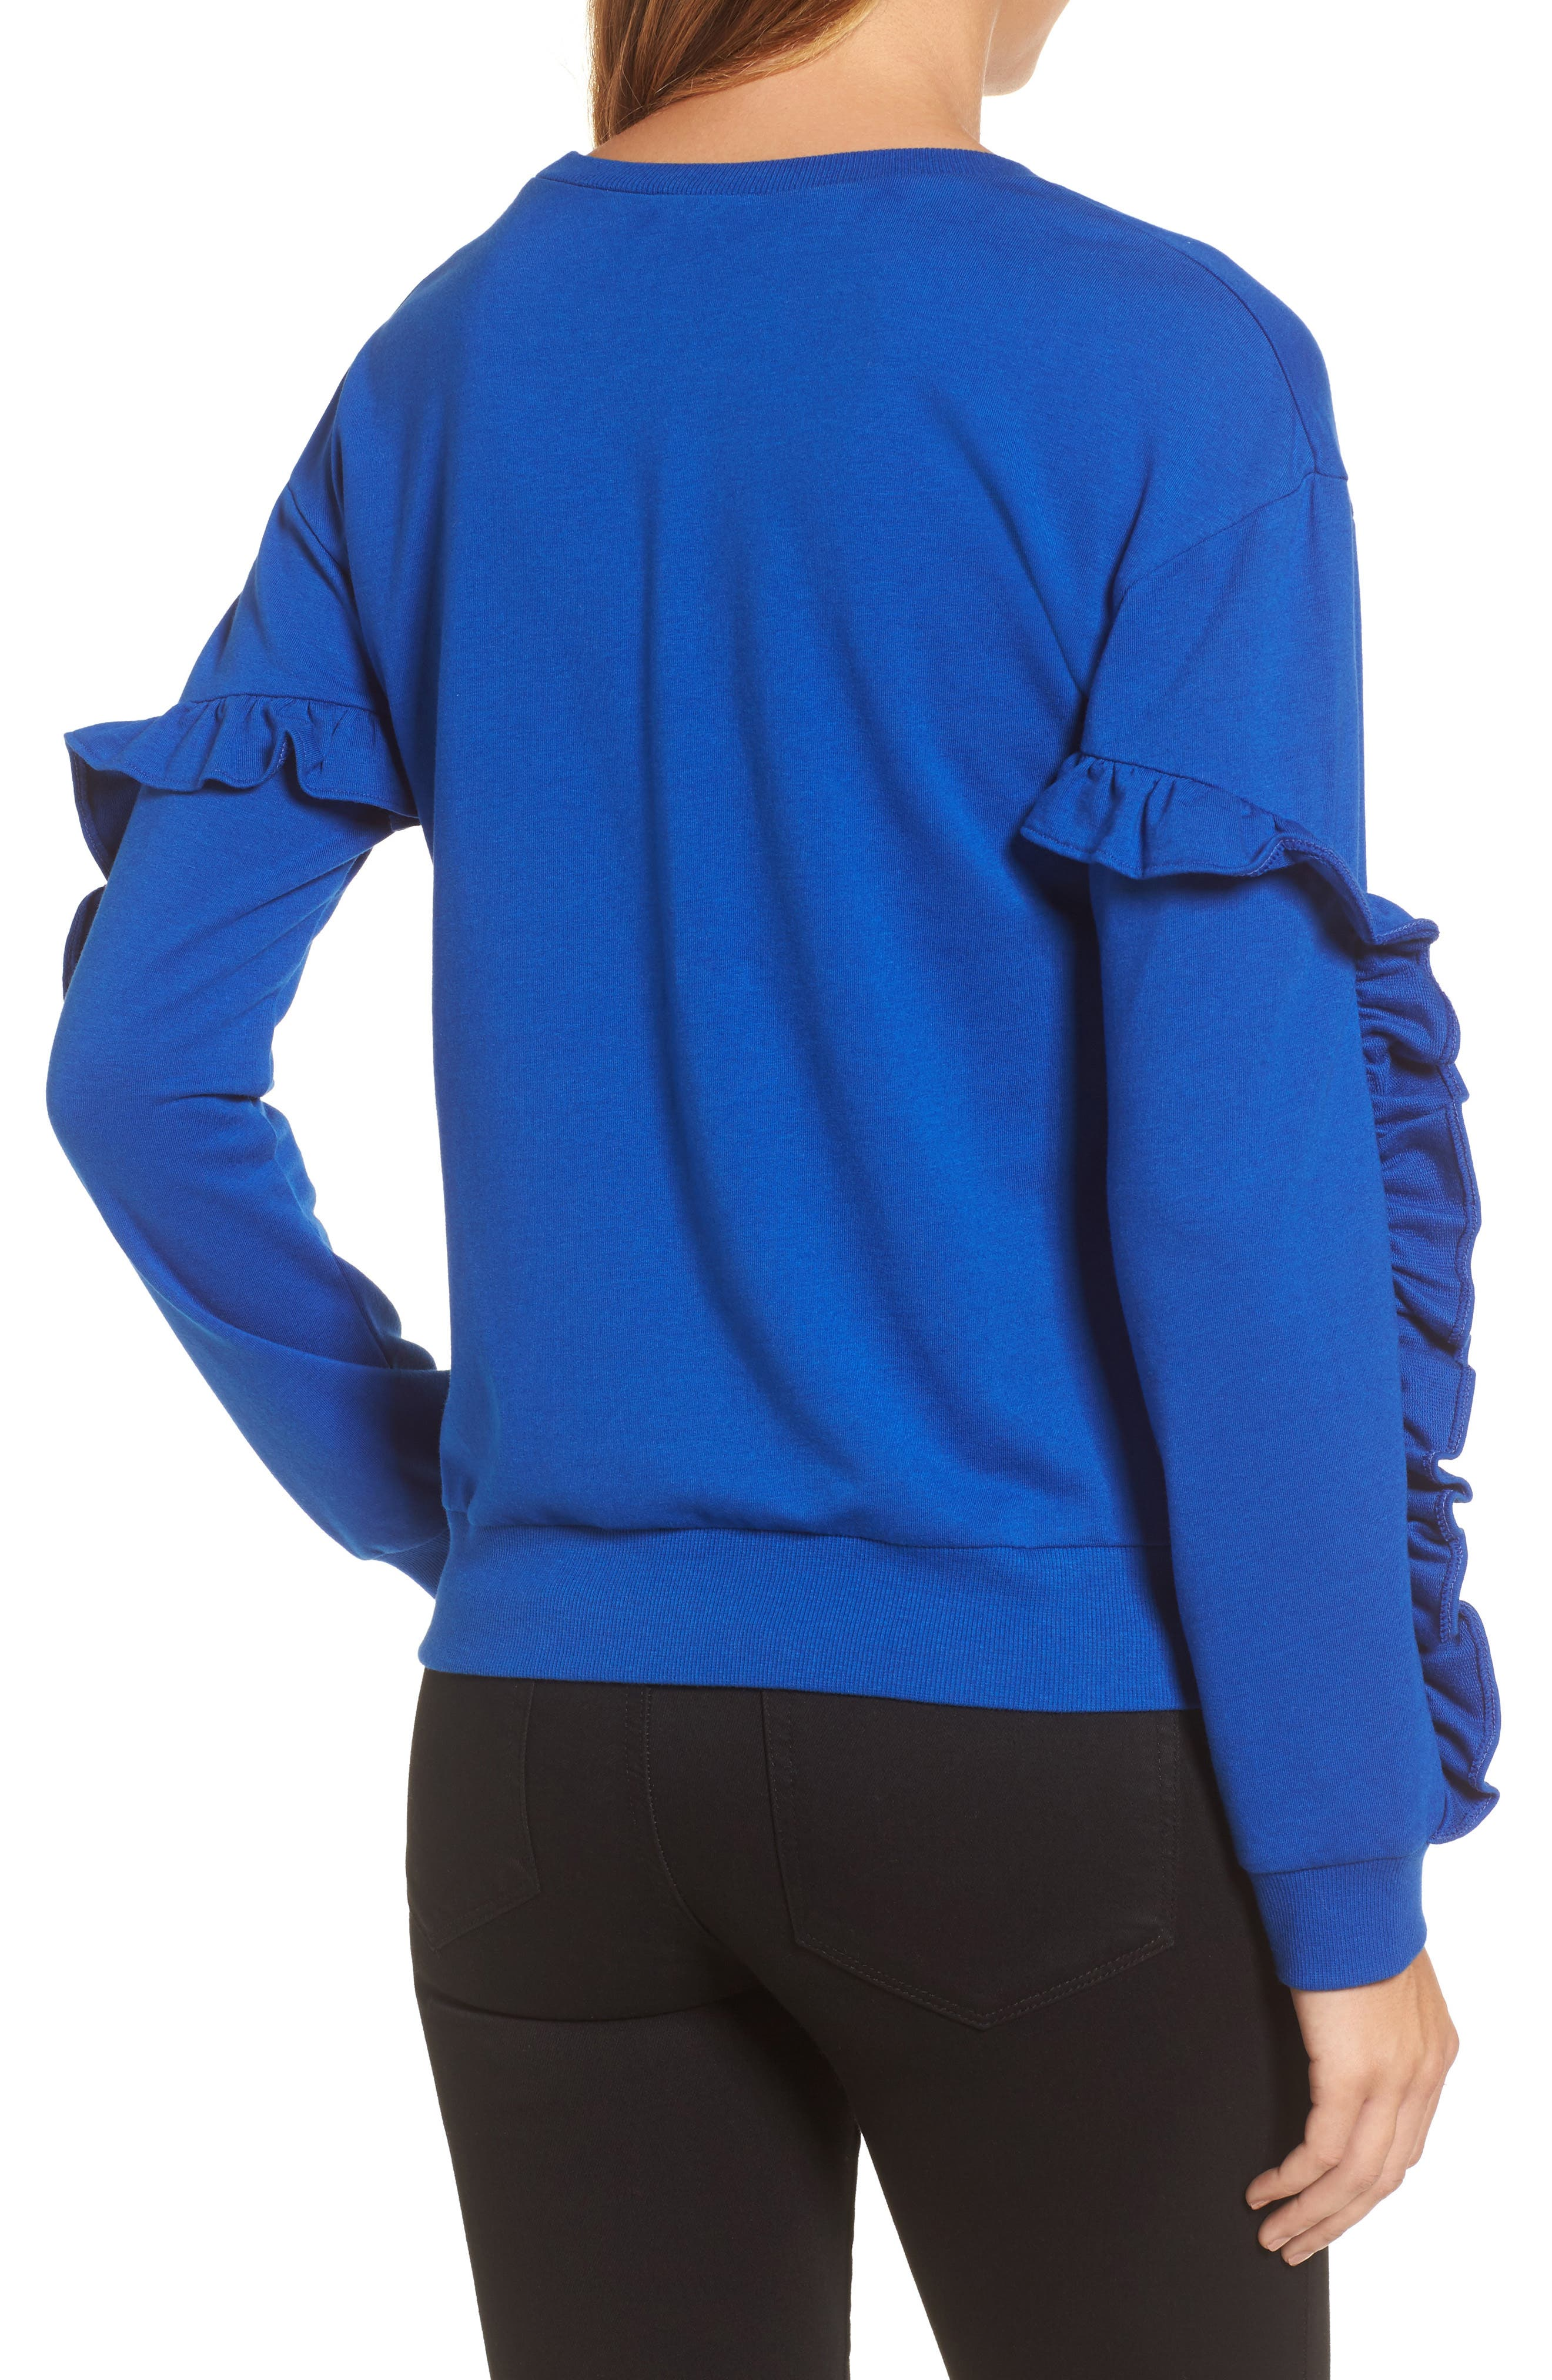 Ruffle Detail Sweatshirt,                             Alternate thumbnail 2, color,                             Blue Surf